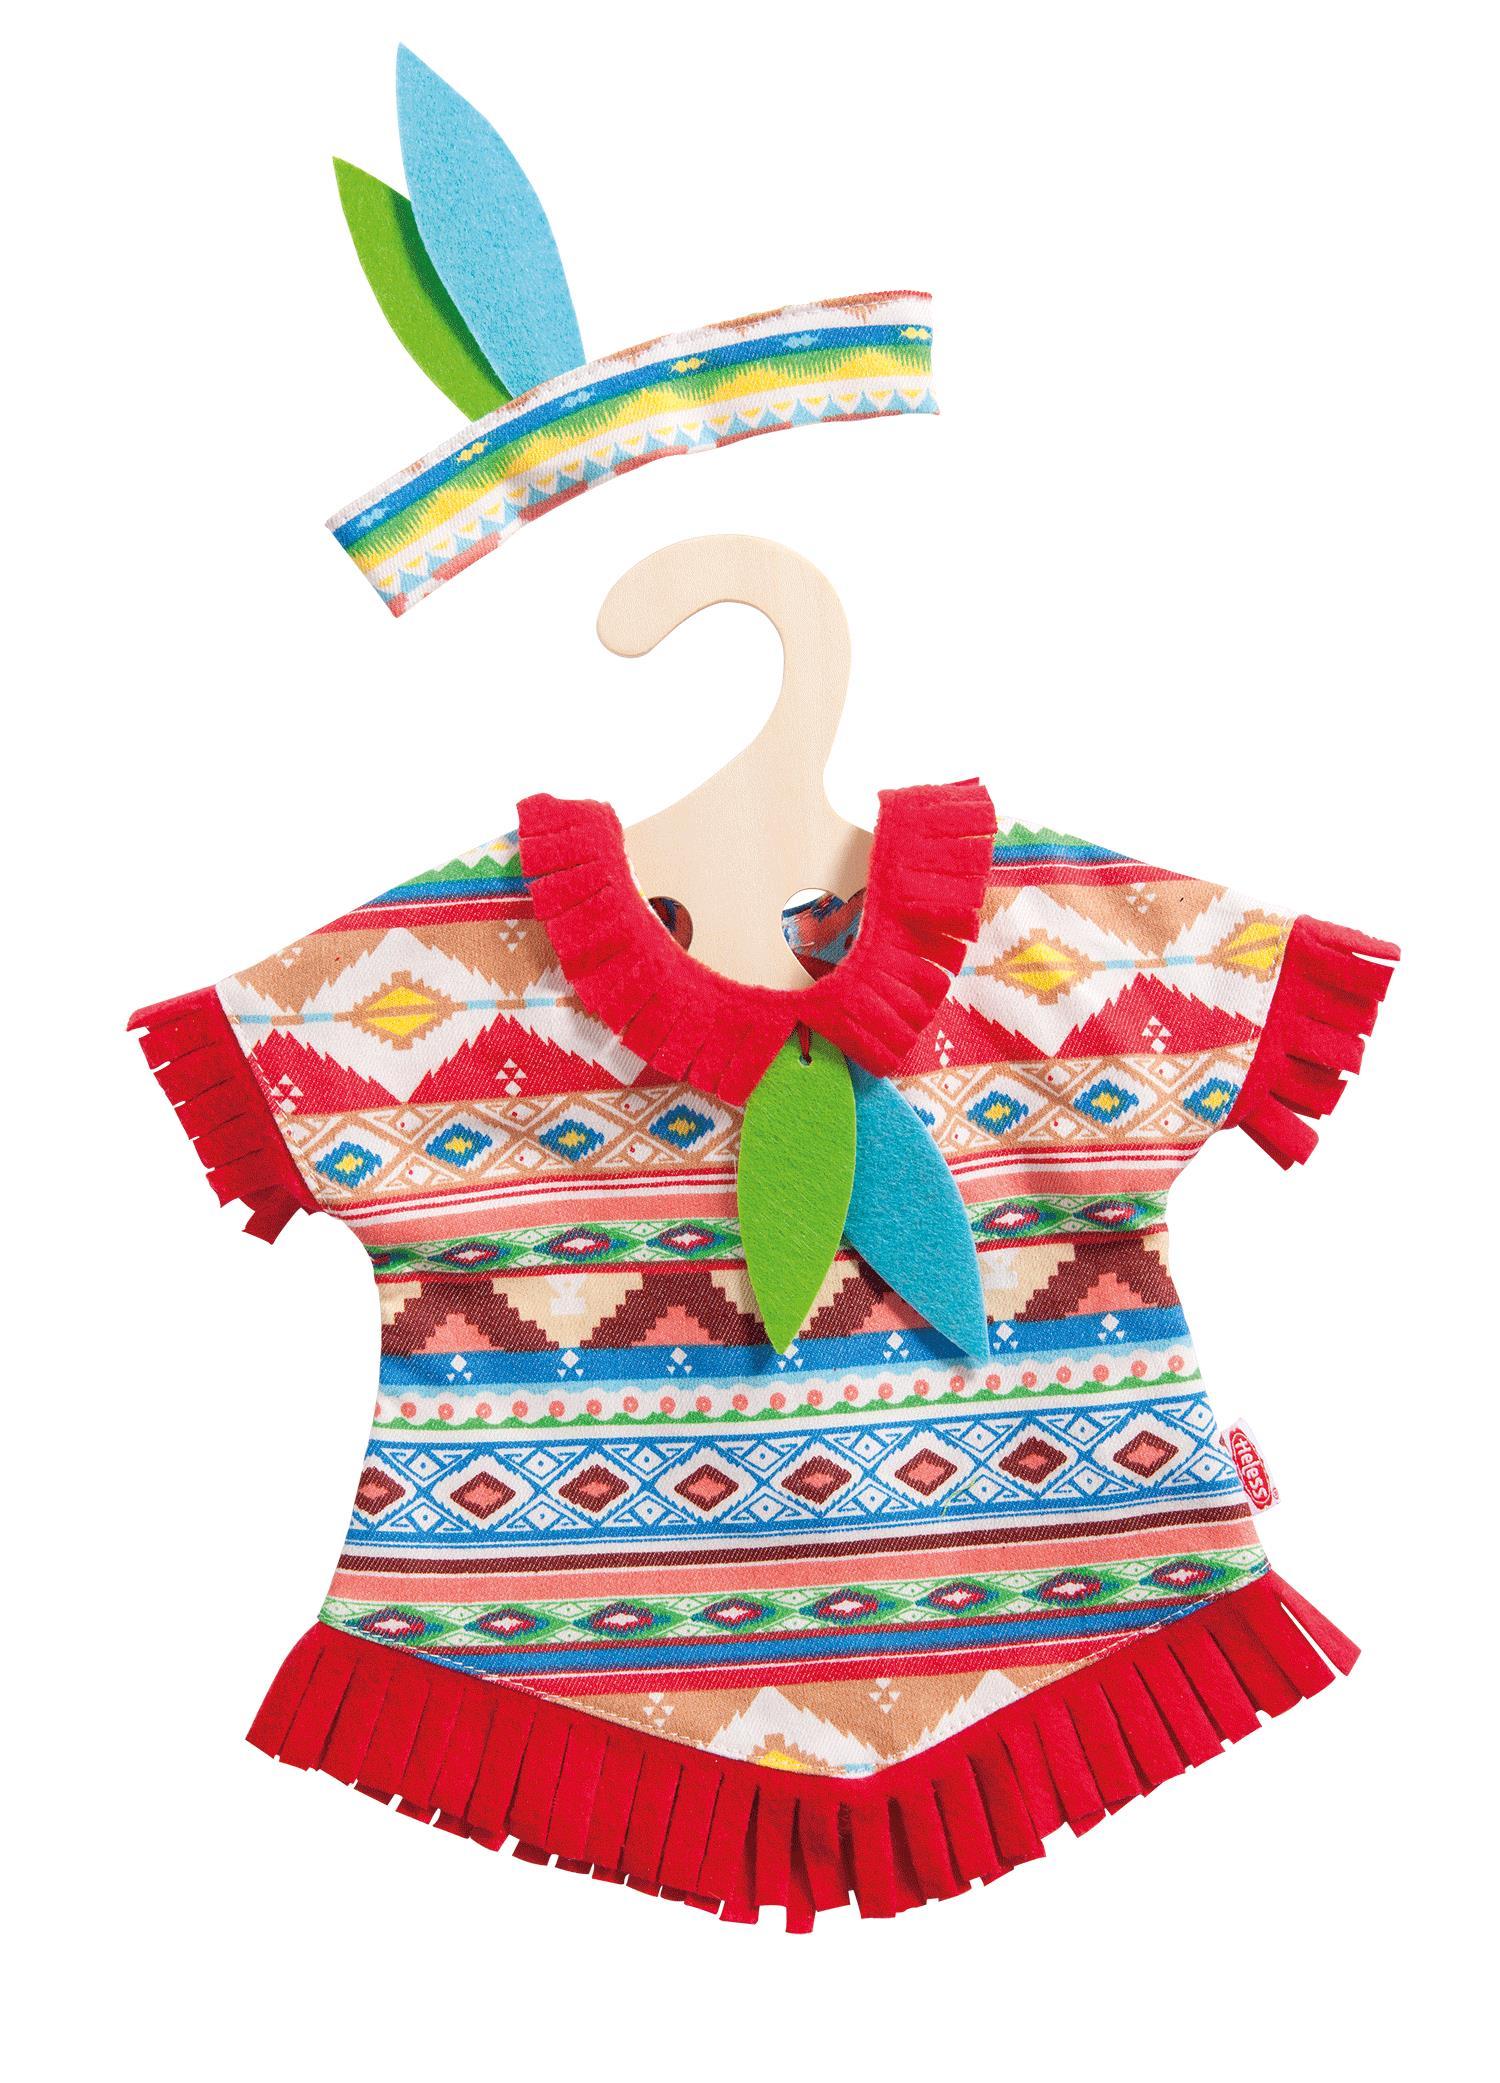 Heless Puppen Indianer Set 35-45cm